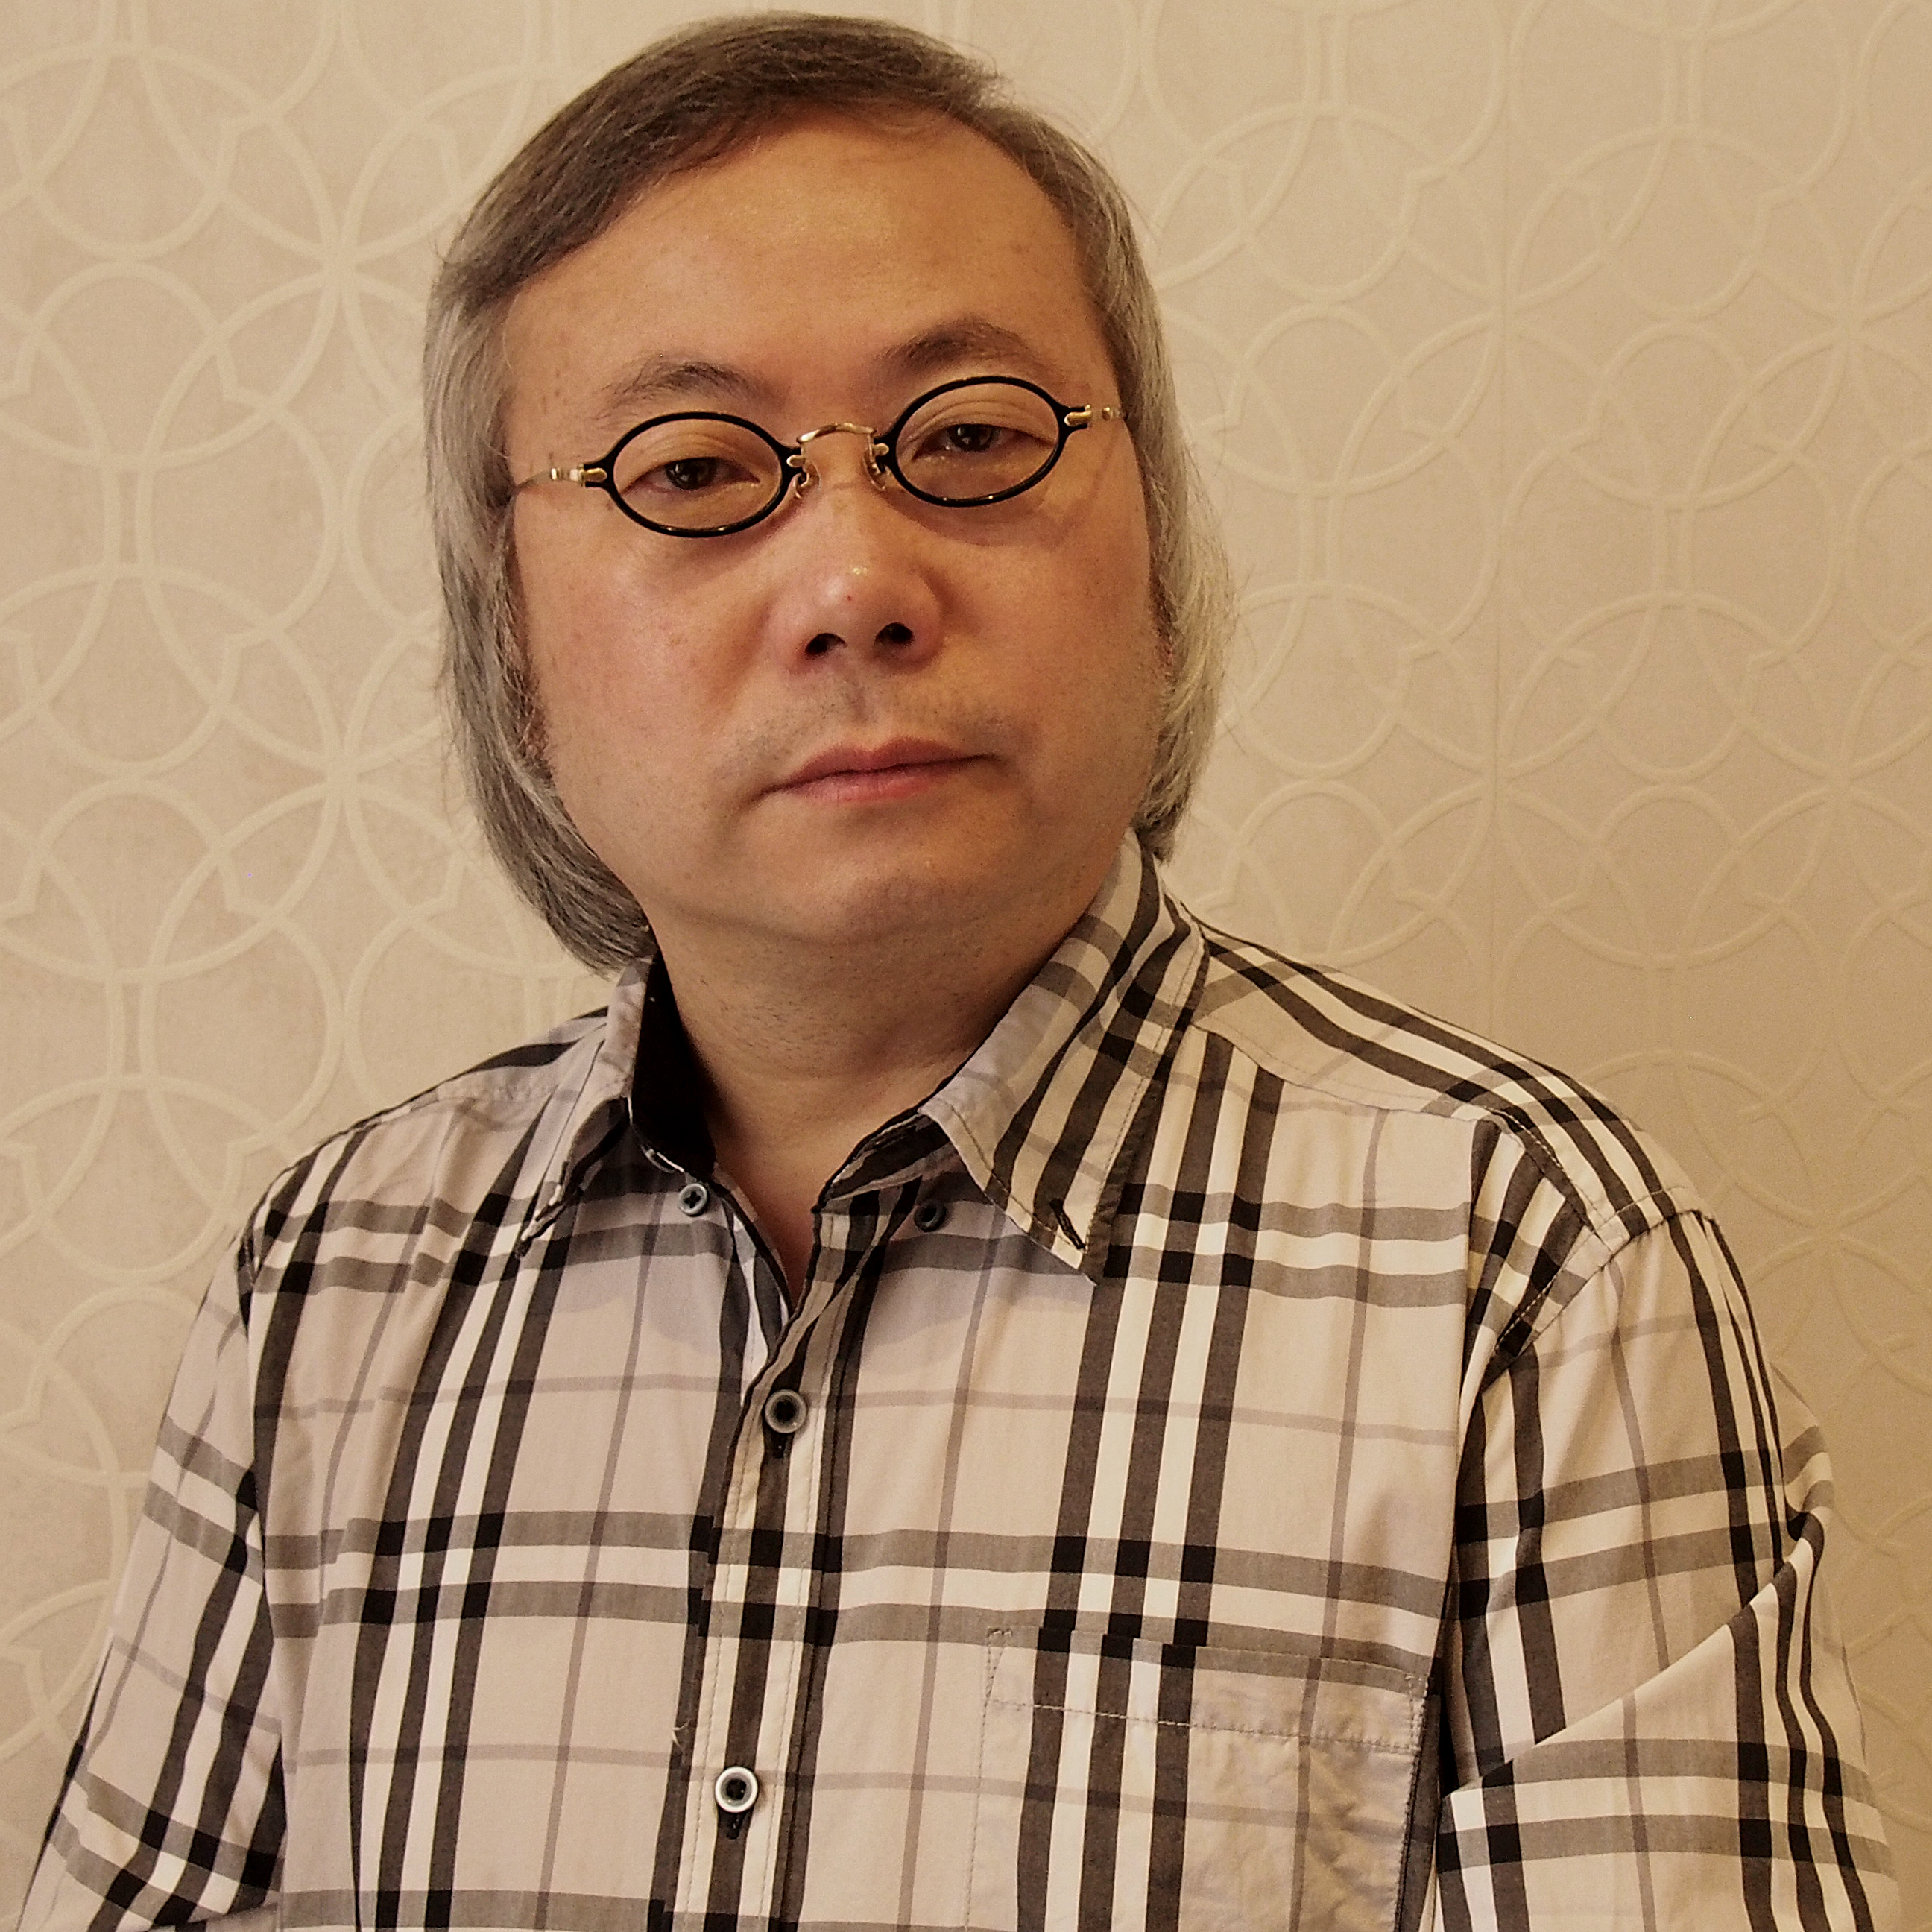 Image of Fu Wenjun from Wikidata